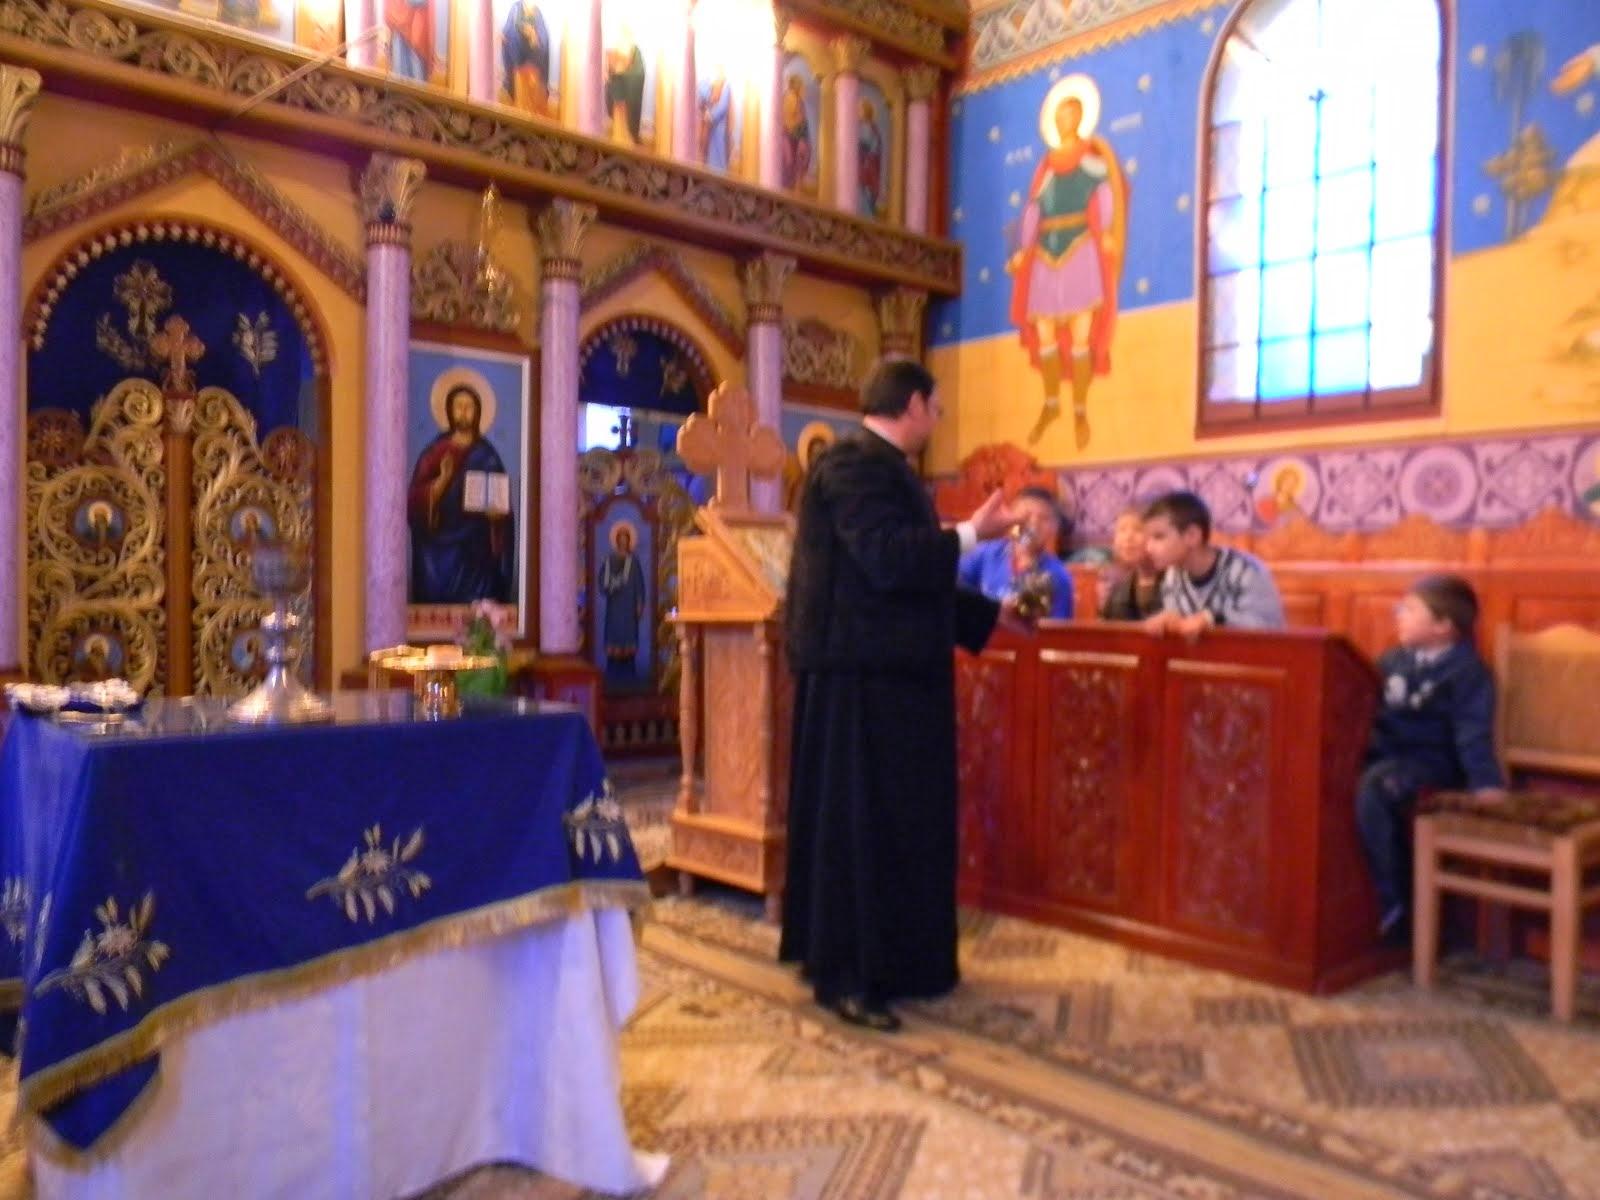 Proiect ,, Sfanta Euharistie - lumina vieţii creştine,, martie 2014